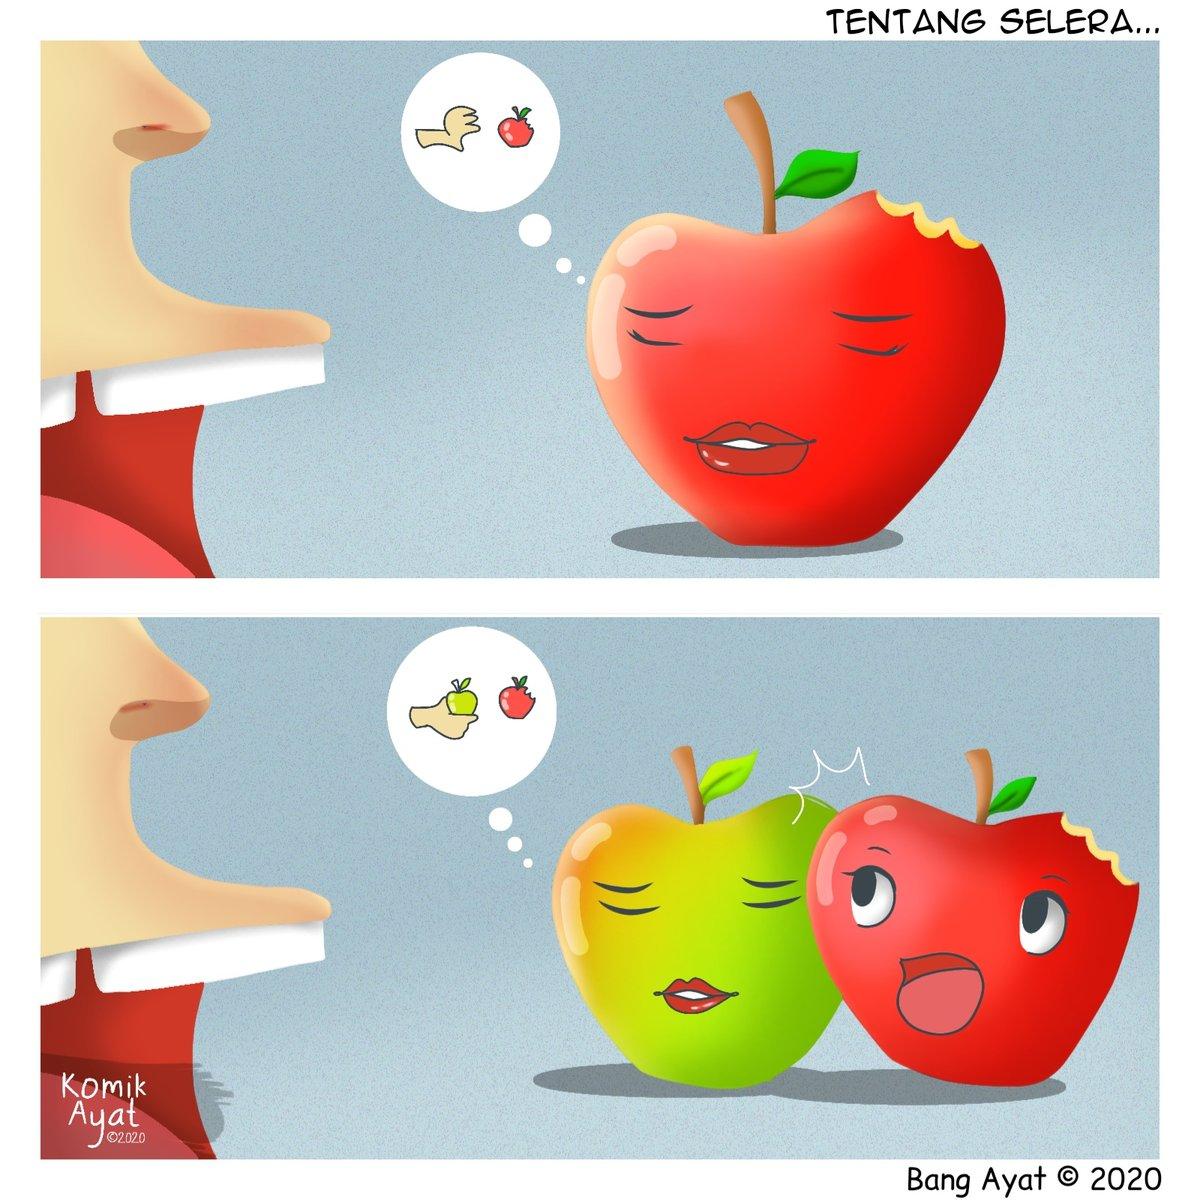 #kisahvisualkeseharian Asah otak dulu napa!  #komikayat #urangbanjar #komikstrip #iqomic #komikinajah #komiklokalpic.twitter.com/exFofg7Tgu